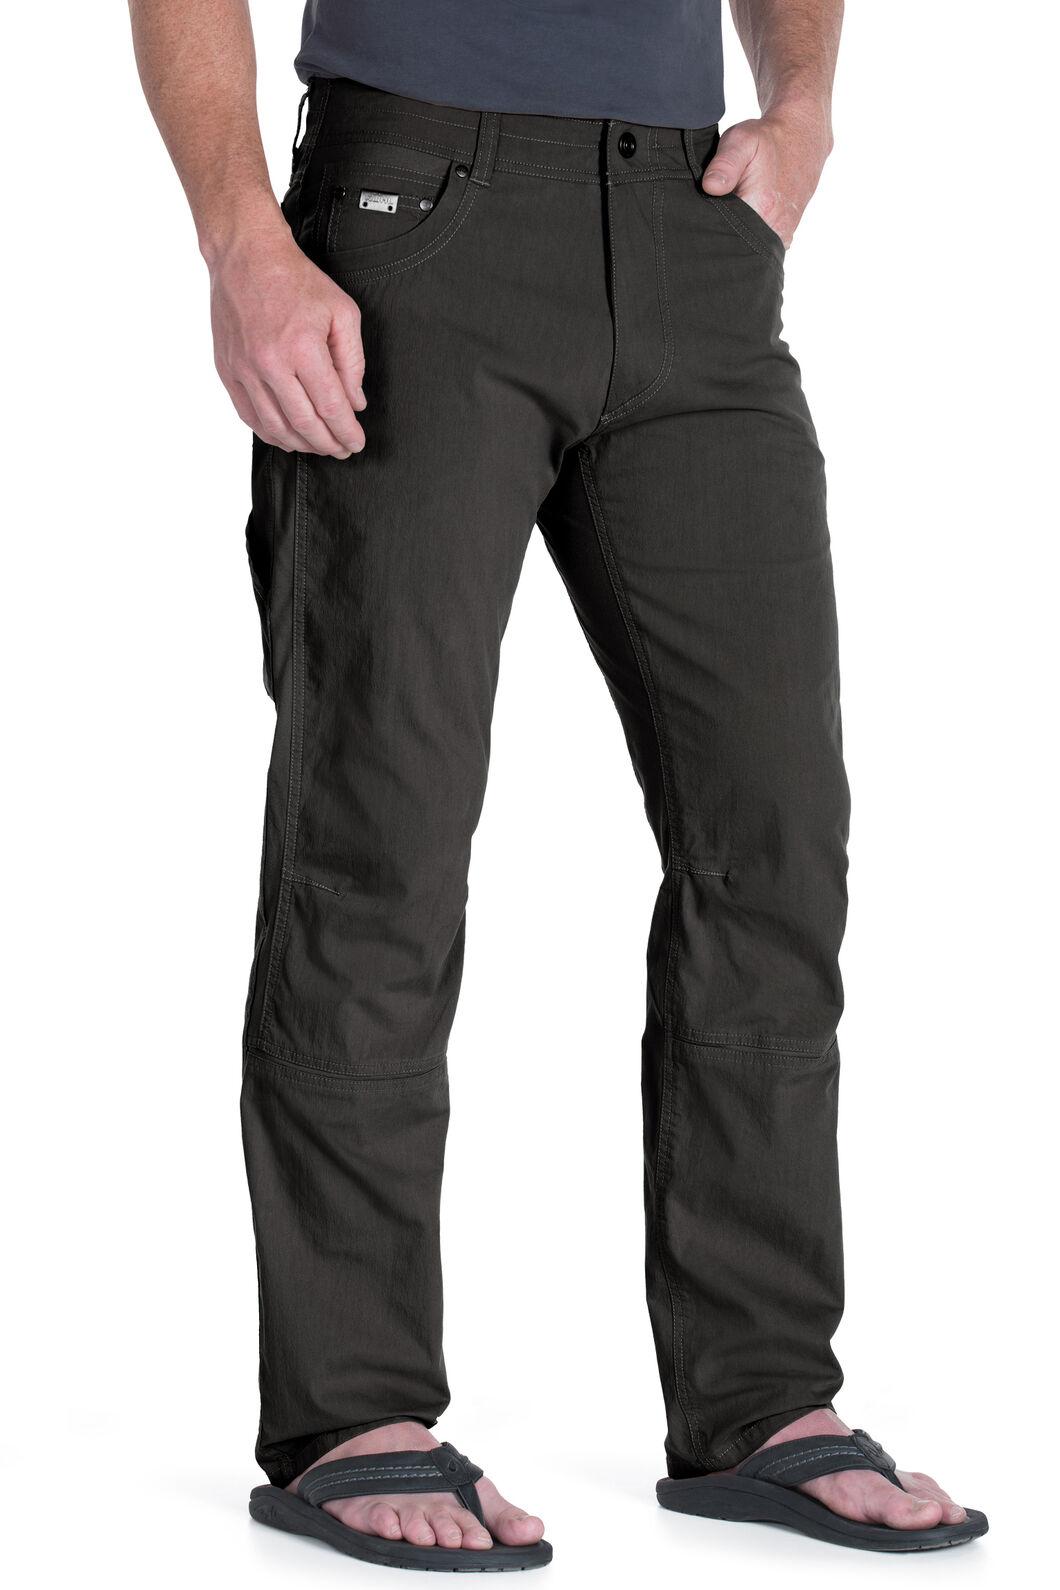 Kuhl Radikl Pants (32 inch) - Men's, Carbon, hi-res